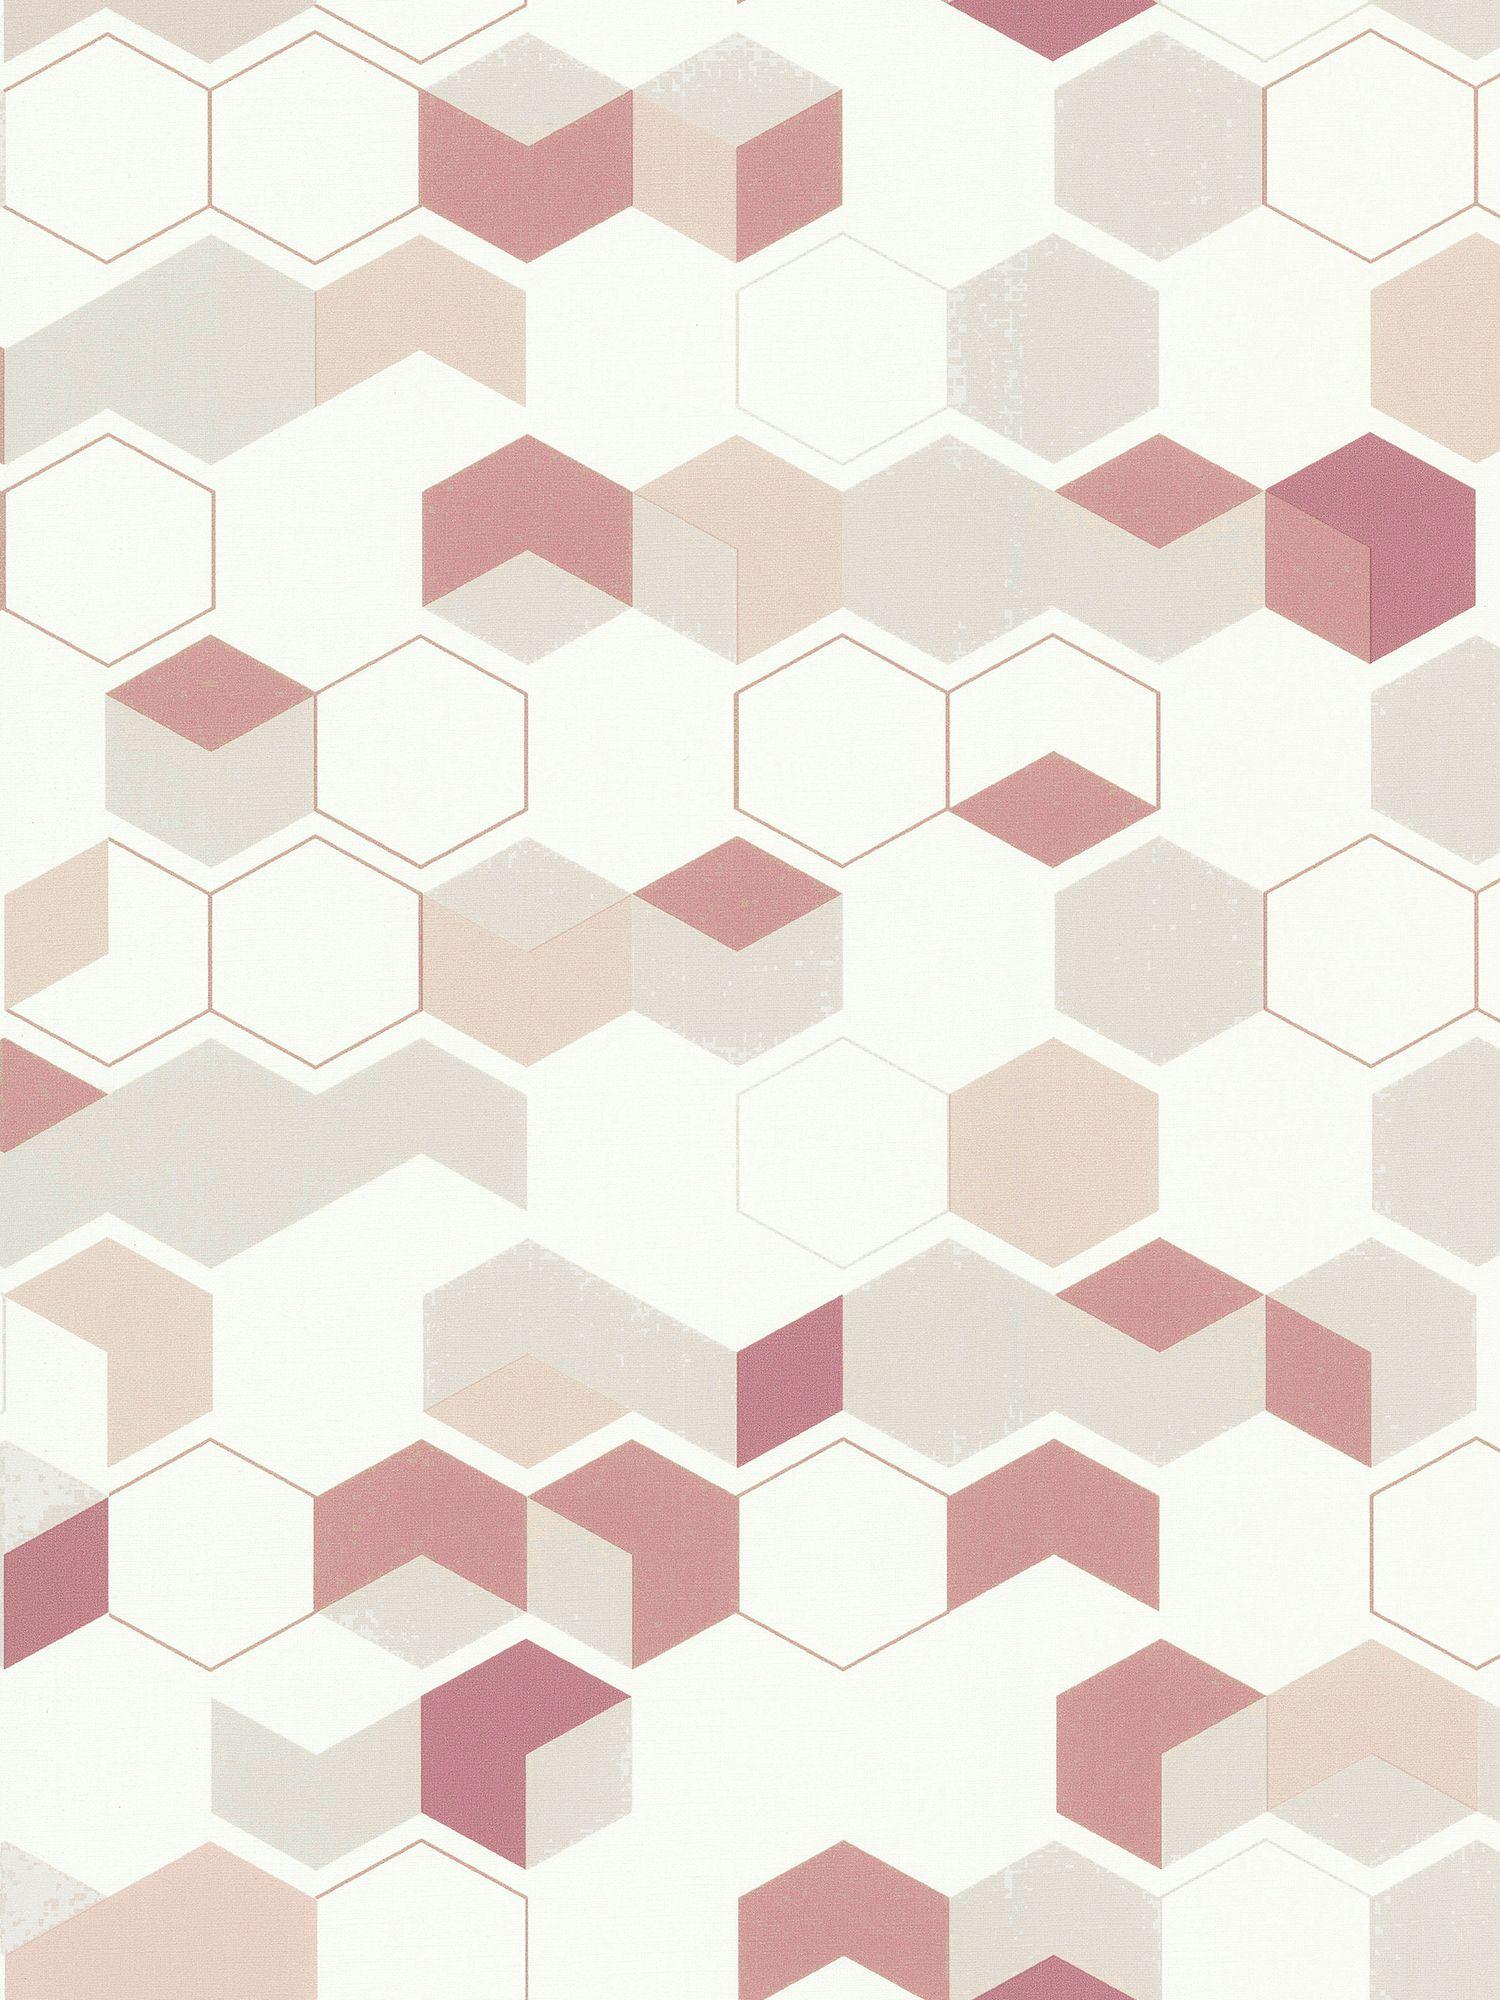 Galerie Galerie Skandi Blocks Wallpaper